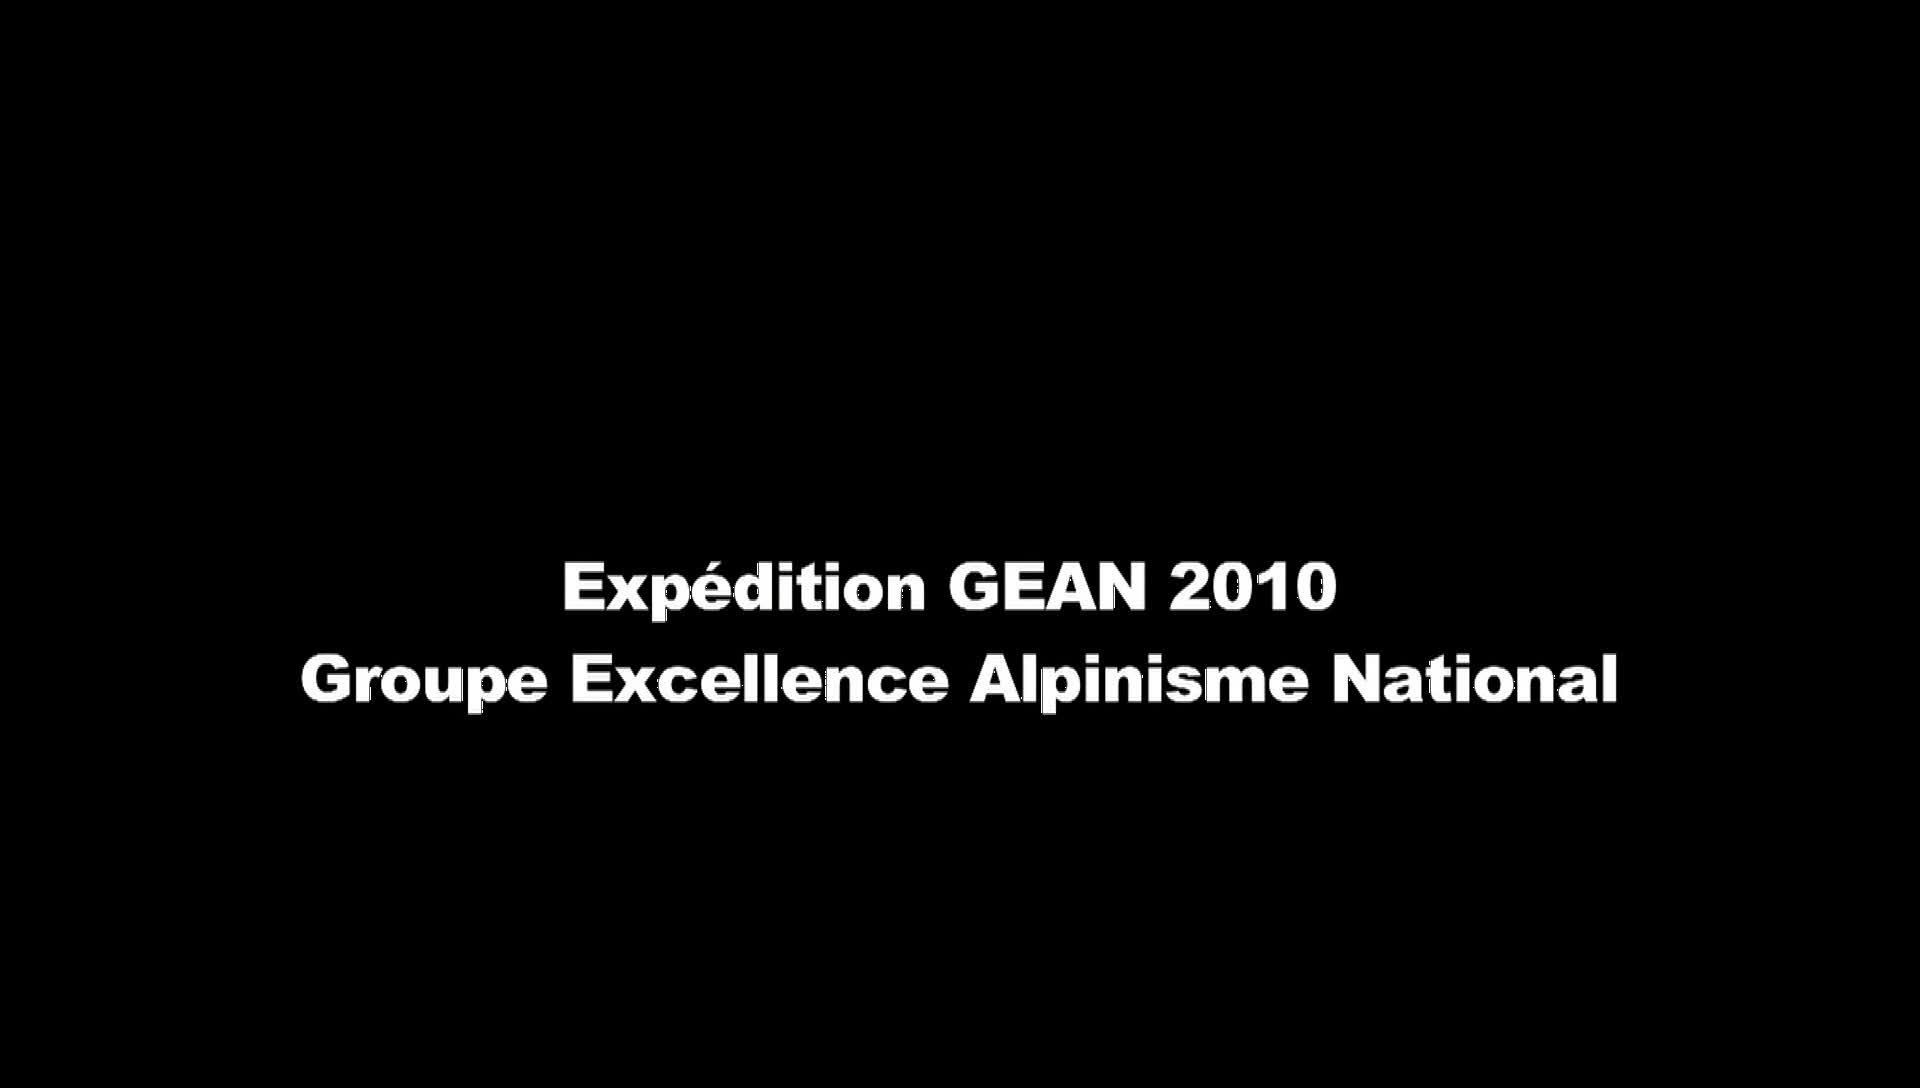 Expédition GEAN 2010, Groupe Excellence Alpinisme National